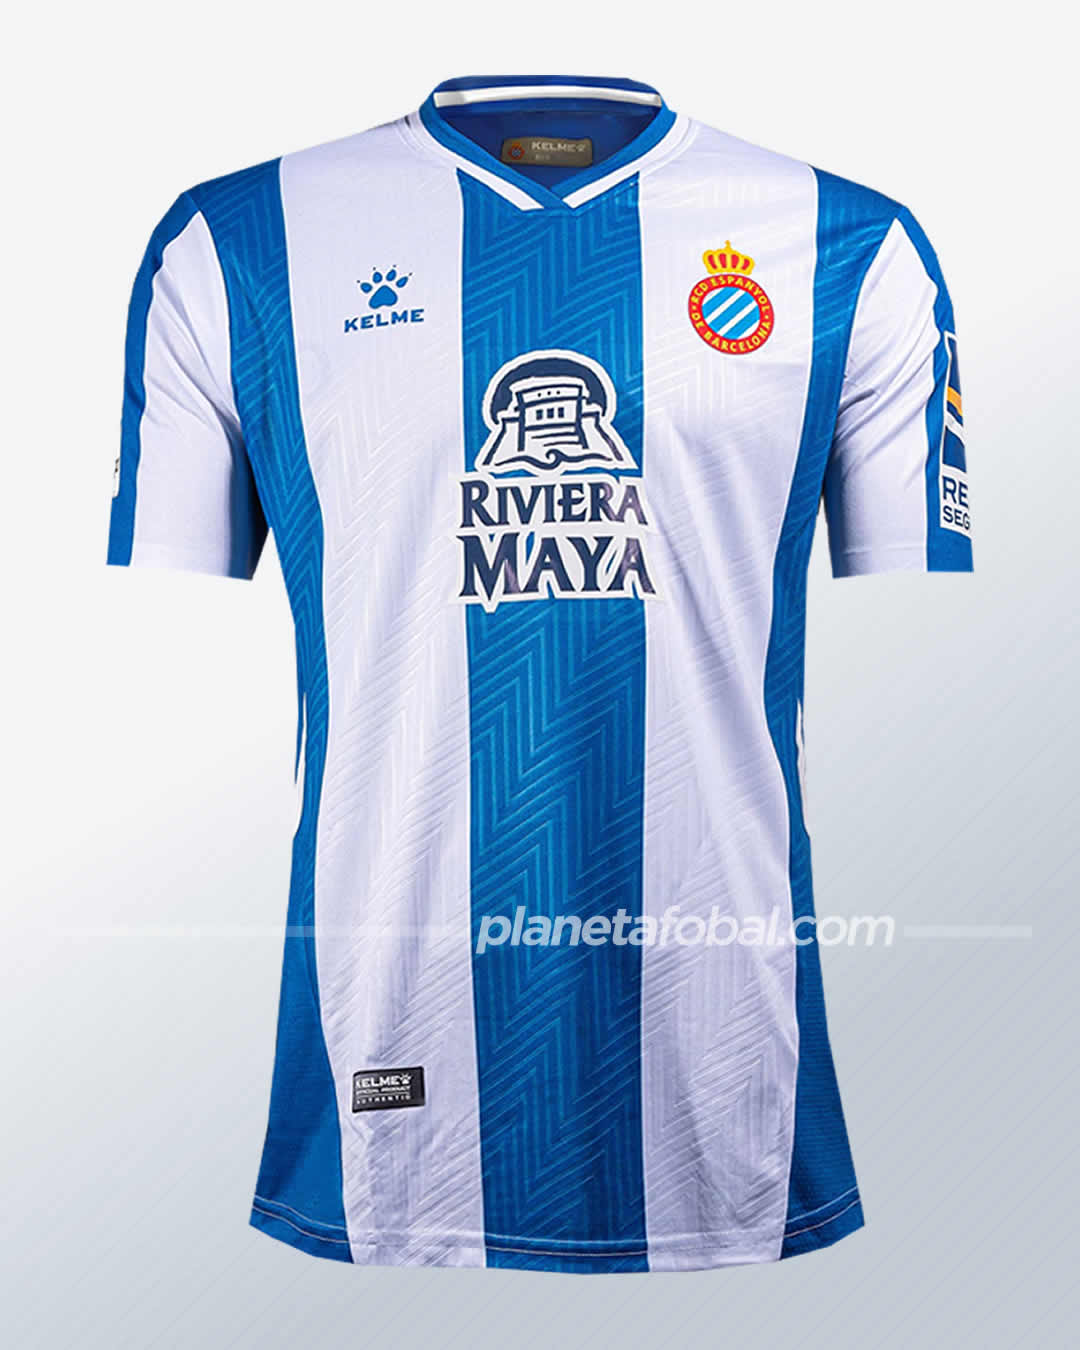 Camisetas Kelme del RCD Espanyol 2021/22